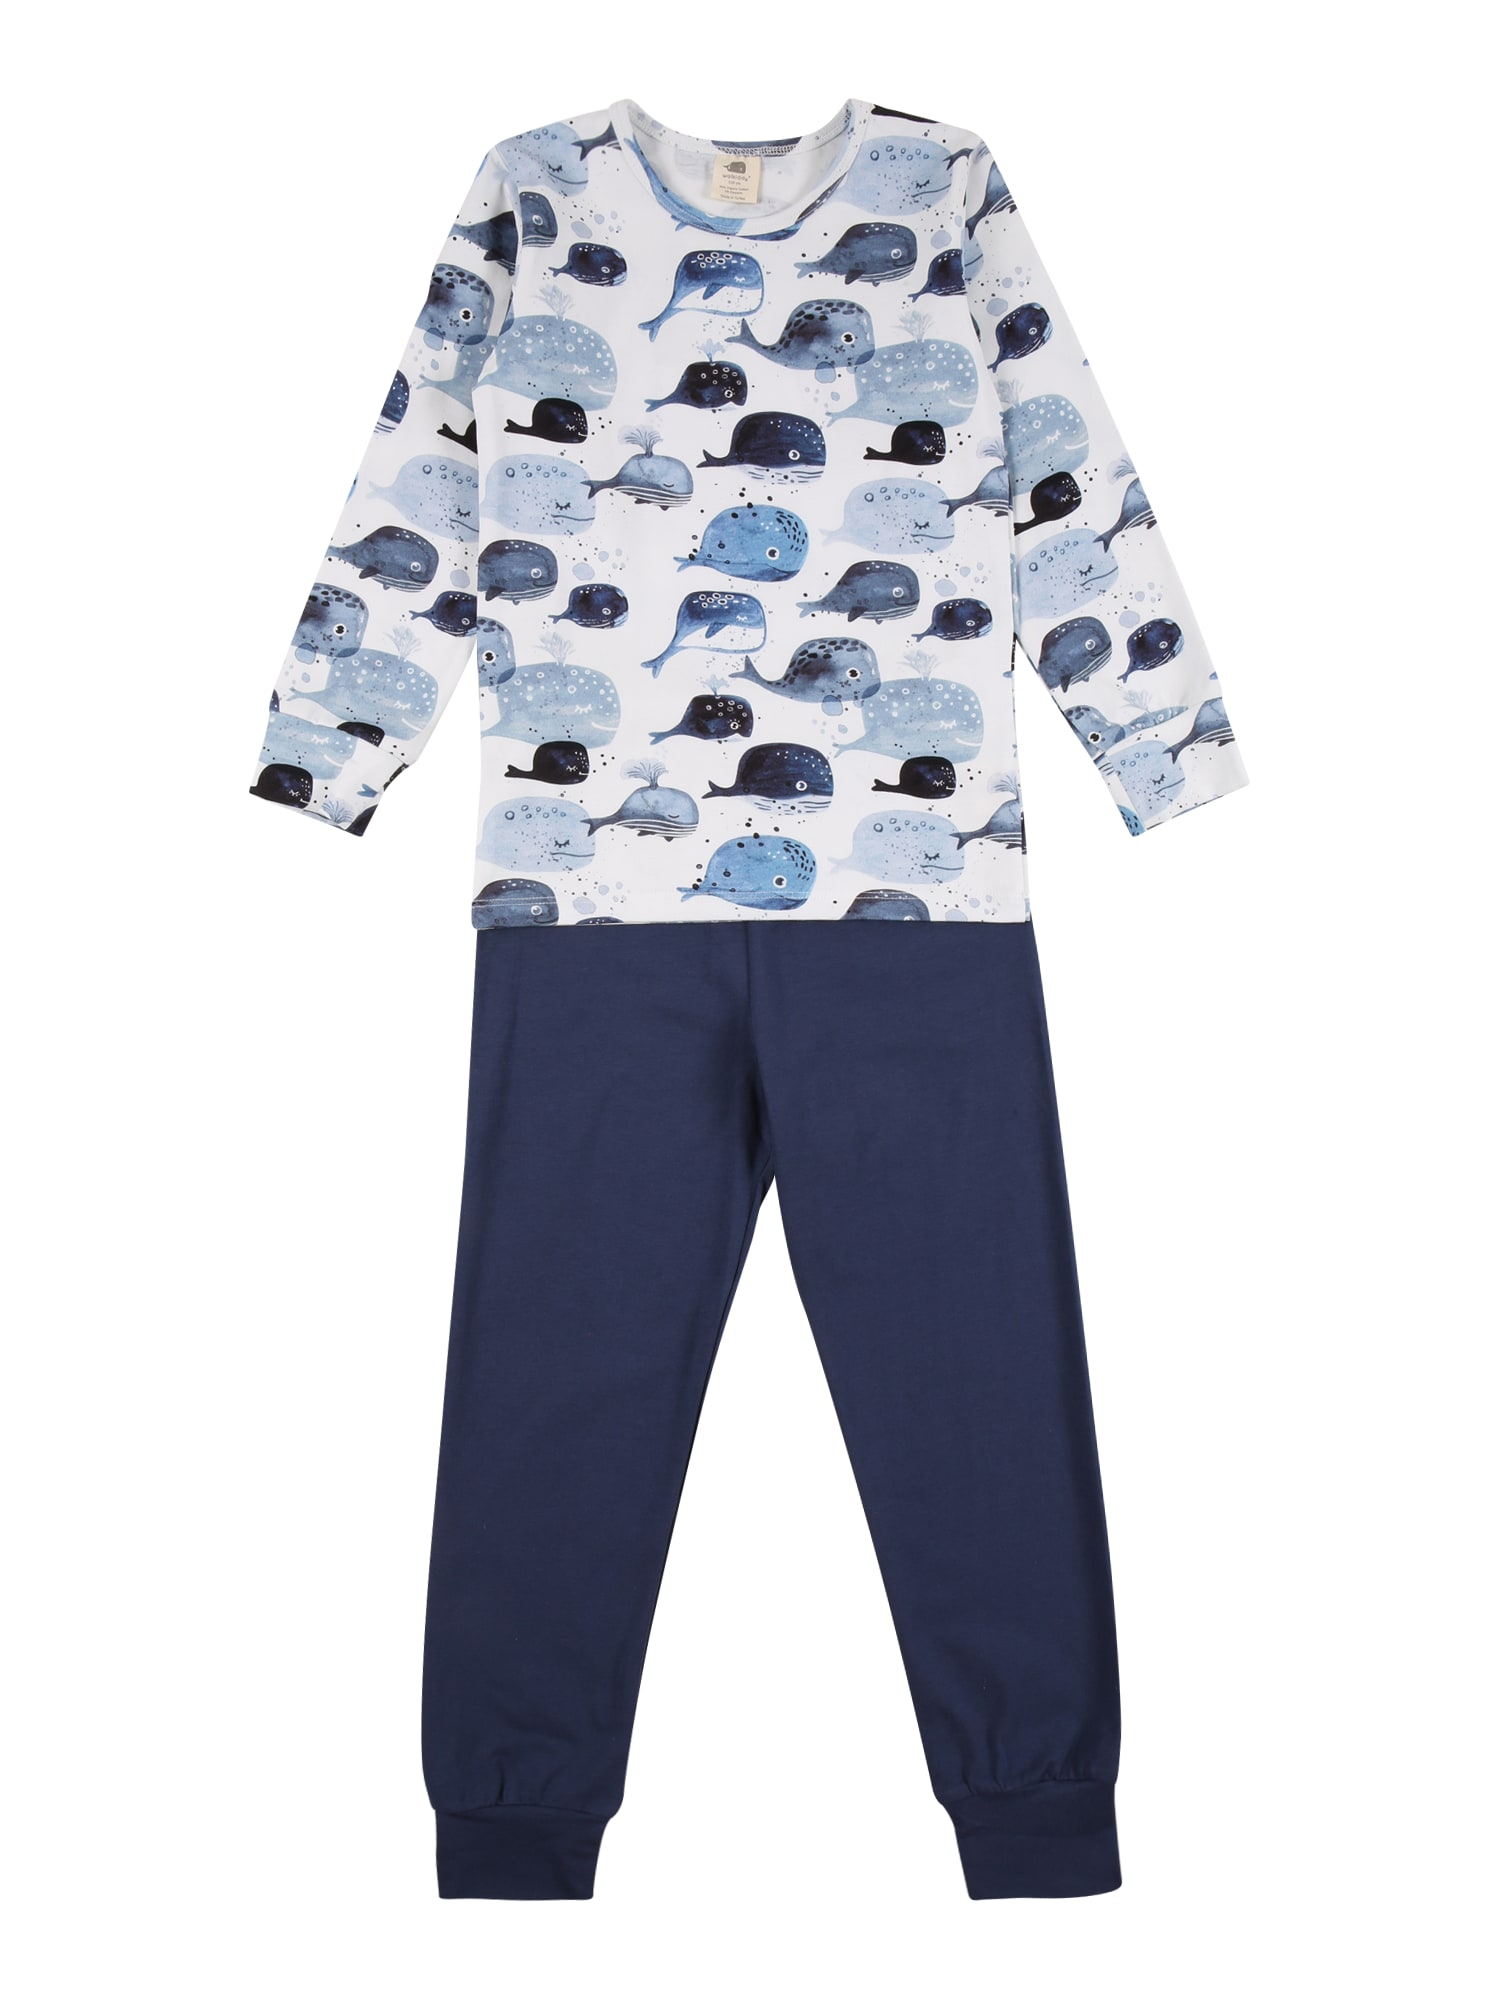 Walkiddy Miego kostiumas nakties mėlyna / šviesiai mėlyna / melsvai pilka / balta